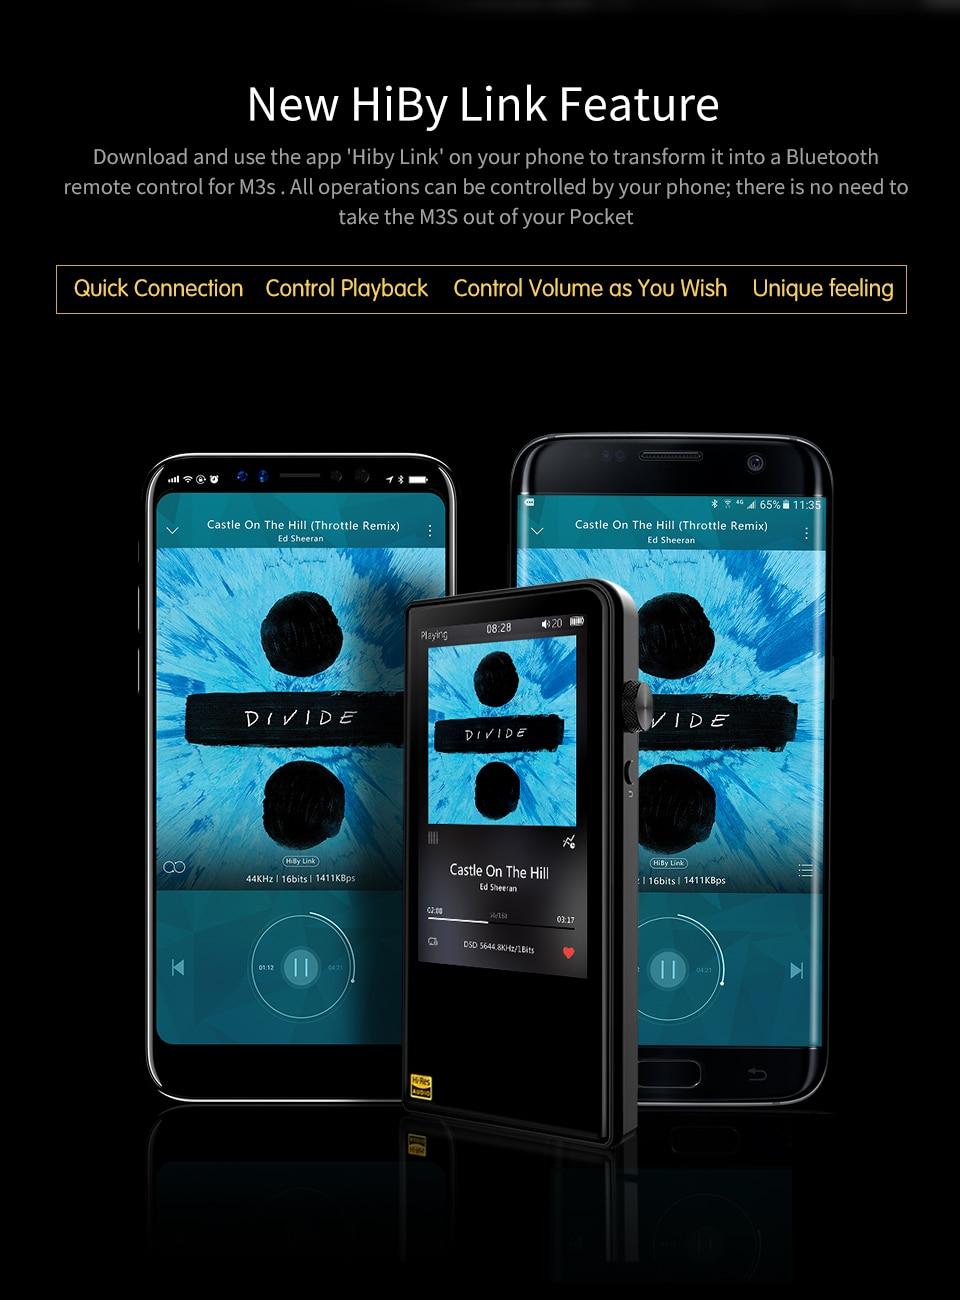 2019 Neuestes Design Xduoo X3ii 2nd Generation Ak4490 Bluetooth Tragbare Hd Lossless Musik Player Dsd128 Usb Dac & Otg Max 256g Hiby Link Mp4 Player